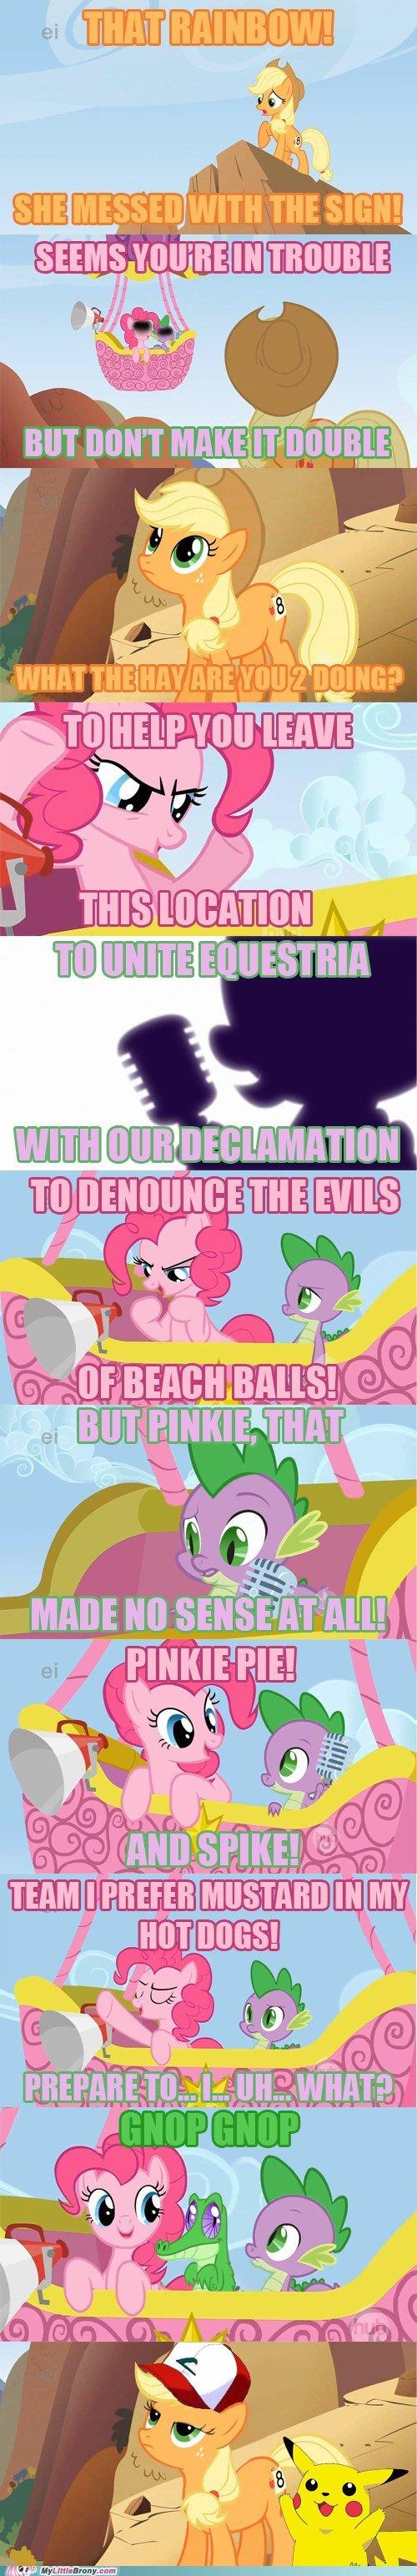 Prepare for trouble. cheezburger.com/6367669248. I H Is Al f 411. irc. EHW Pokemon my little pony Pinkie Pie spike Team rocket Applejack